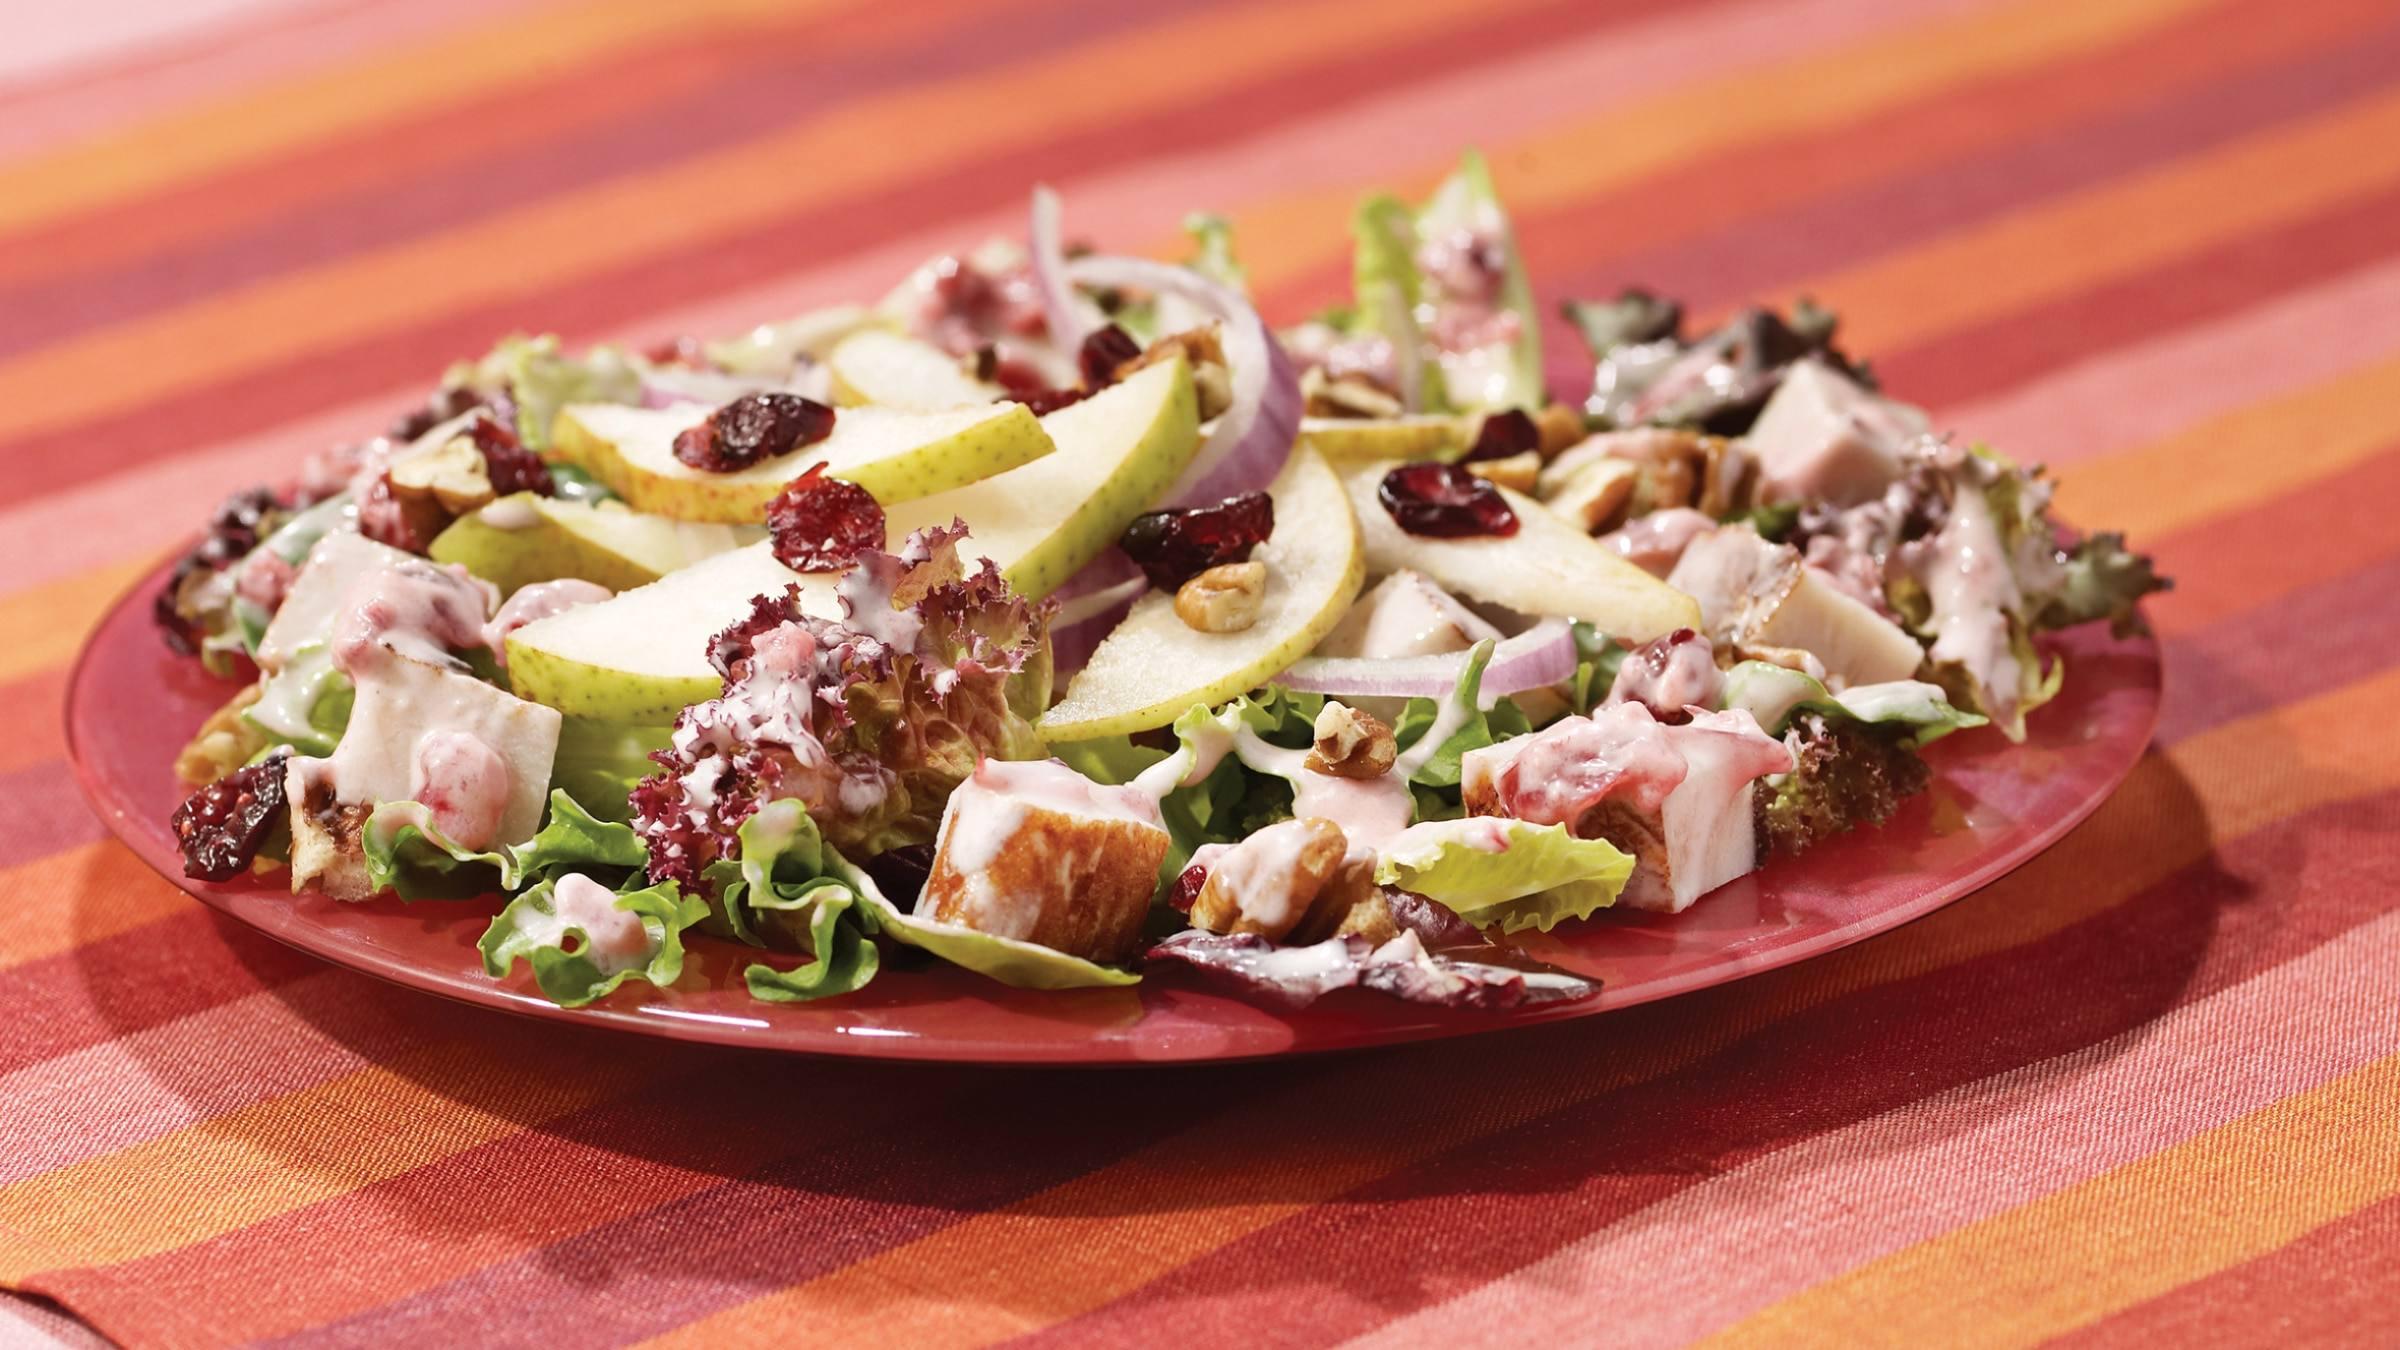 Blushing Cranberry, Pear & Turkey Salad Recipe